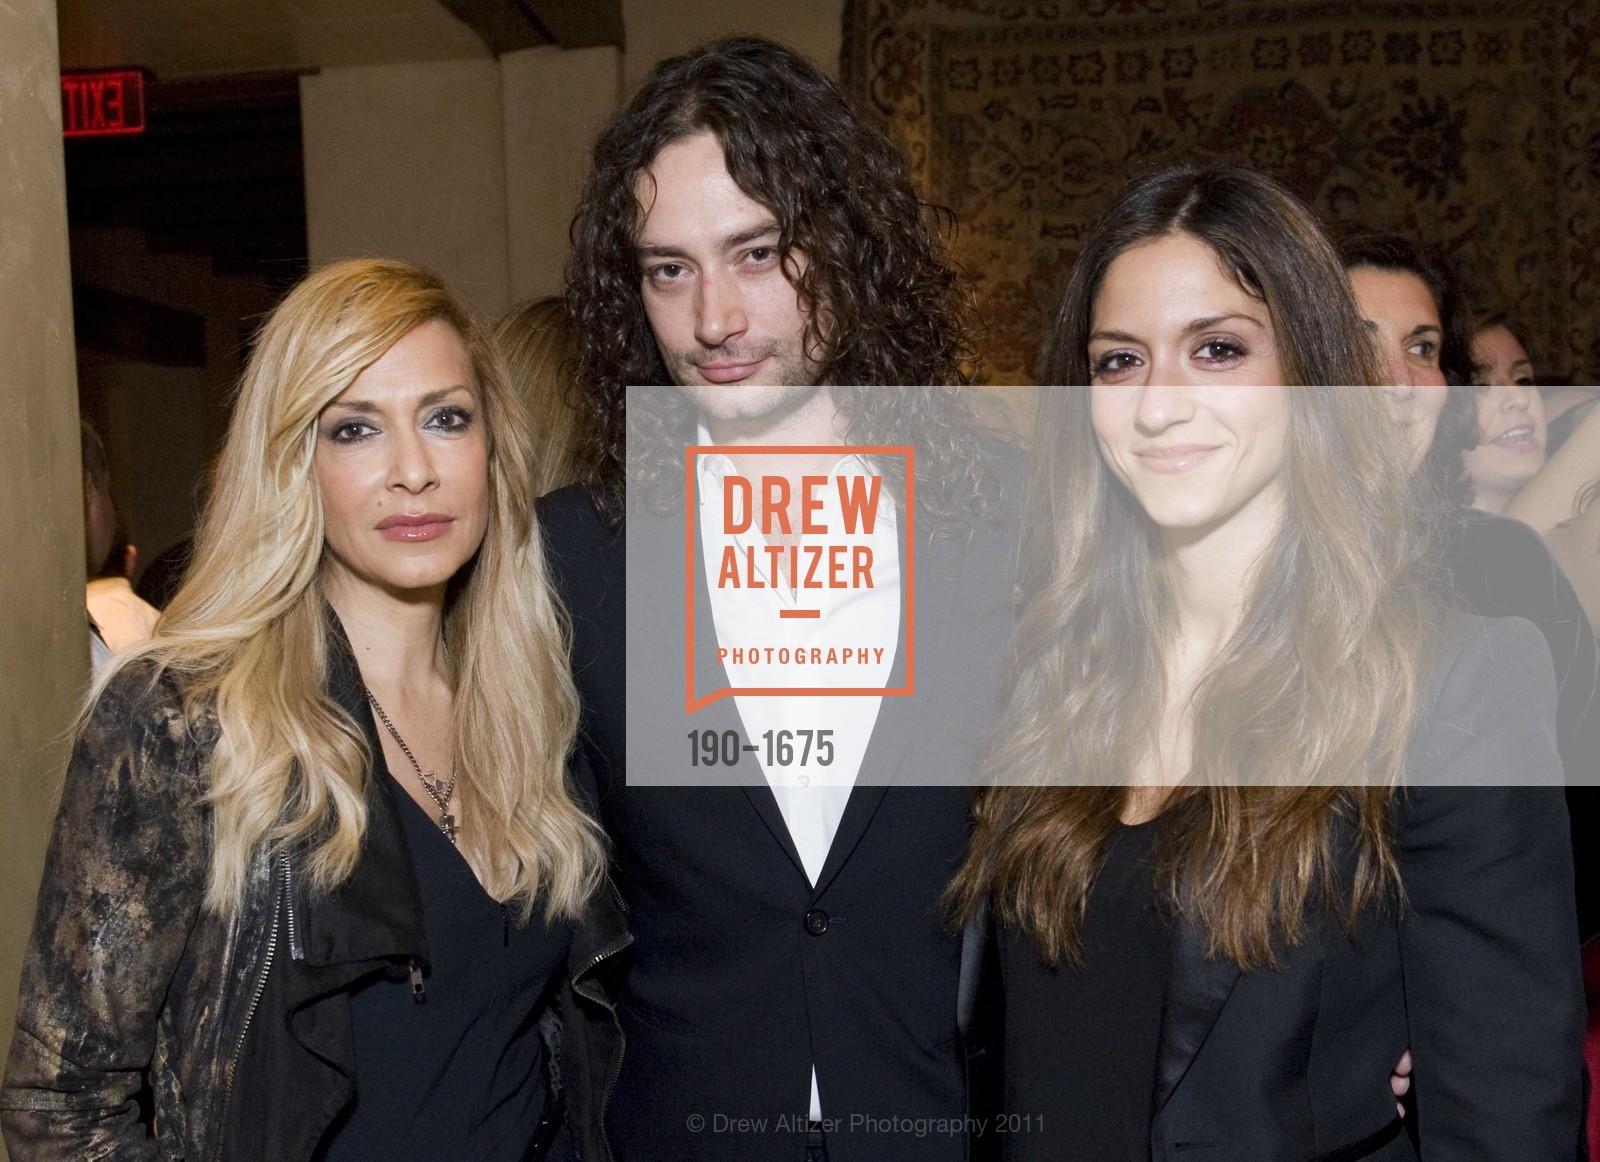 Anna Vissi, Constantine Maroulis, Sofia Karvela, Photo #190-1675